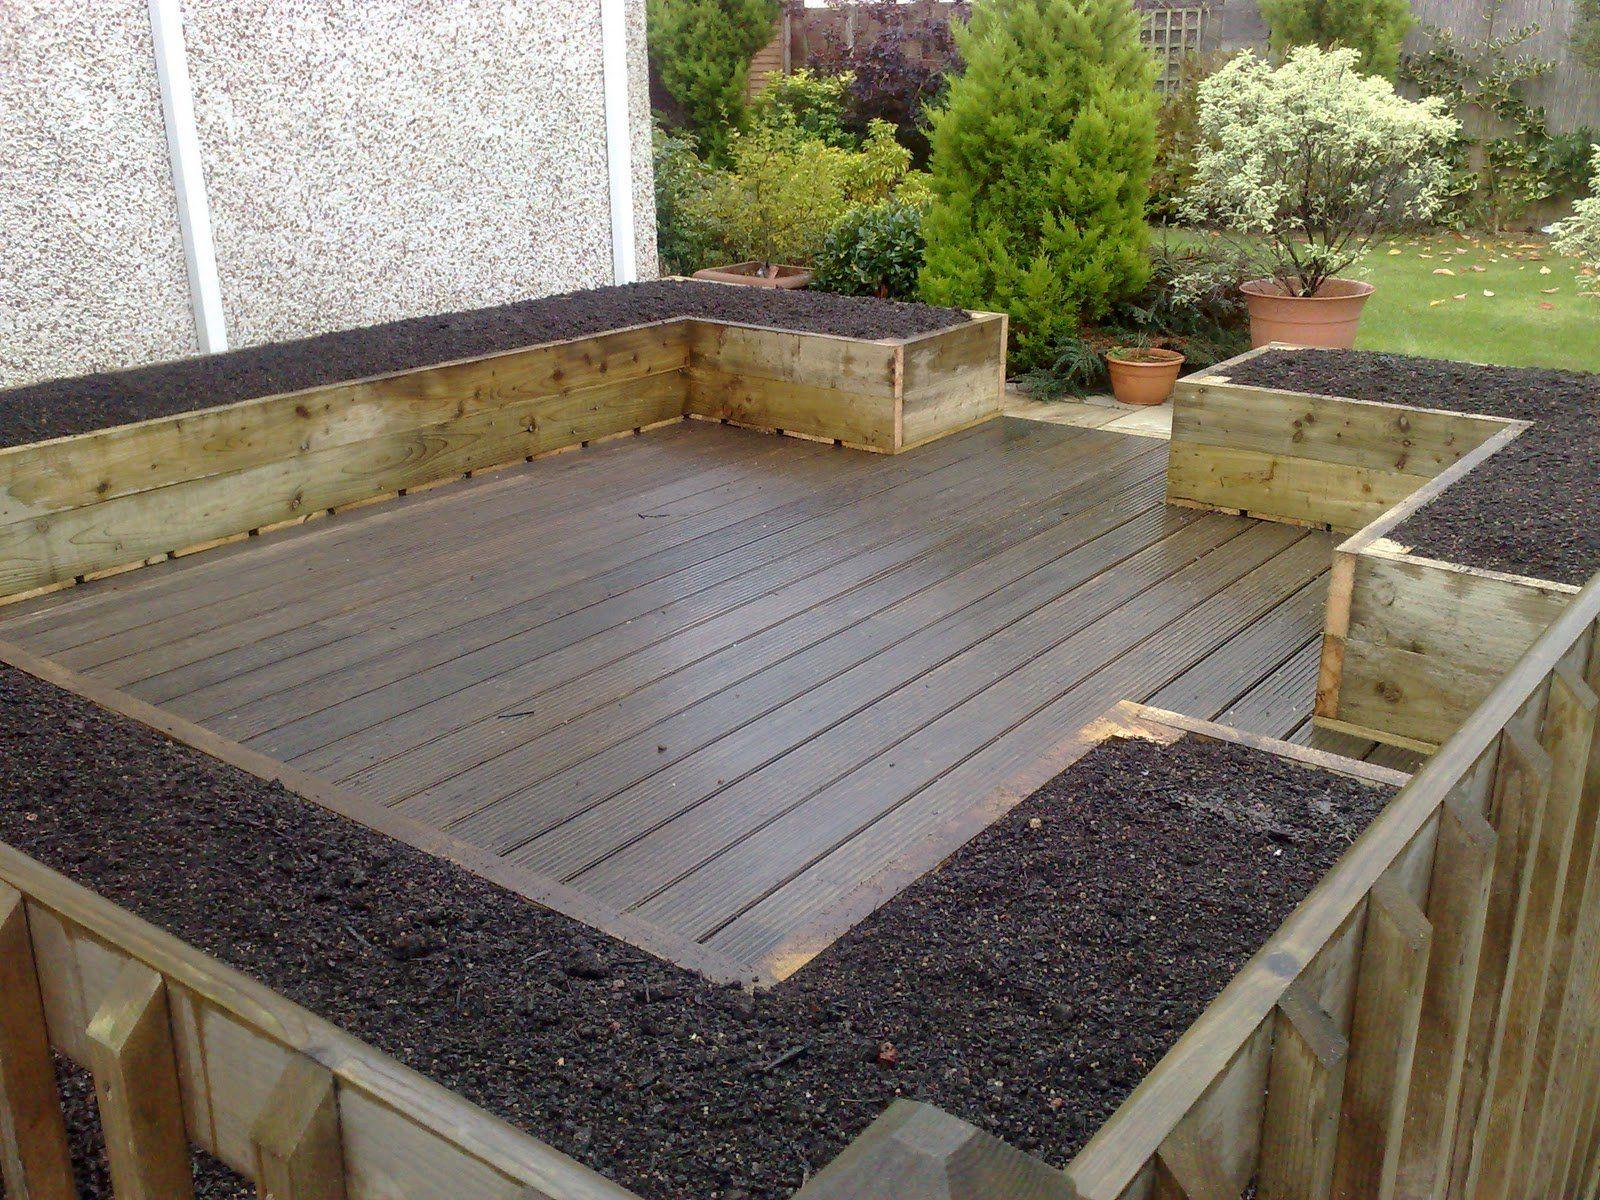 Garden and Patio, Deck And Patio With Hardwood Floor Tiles